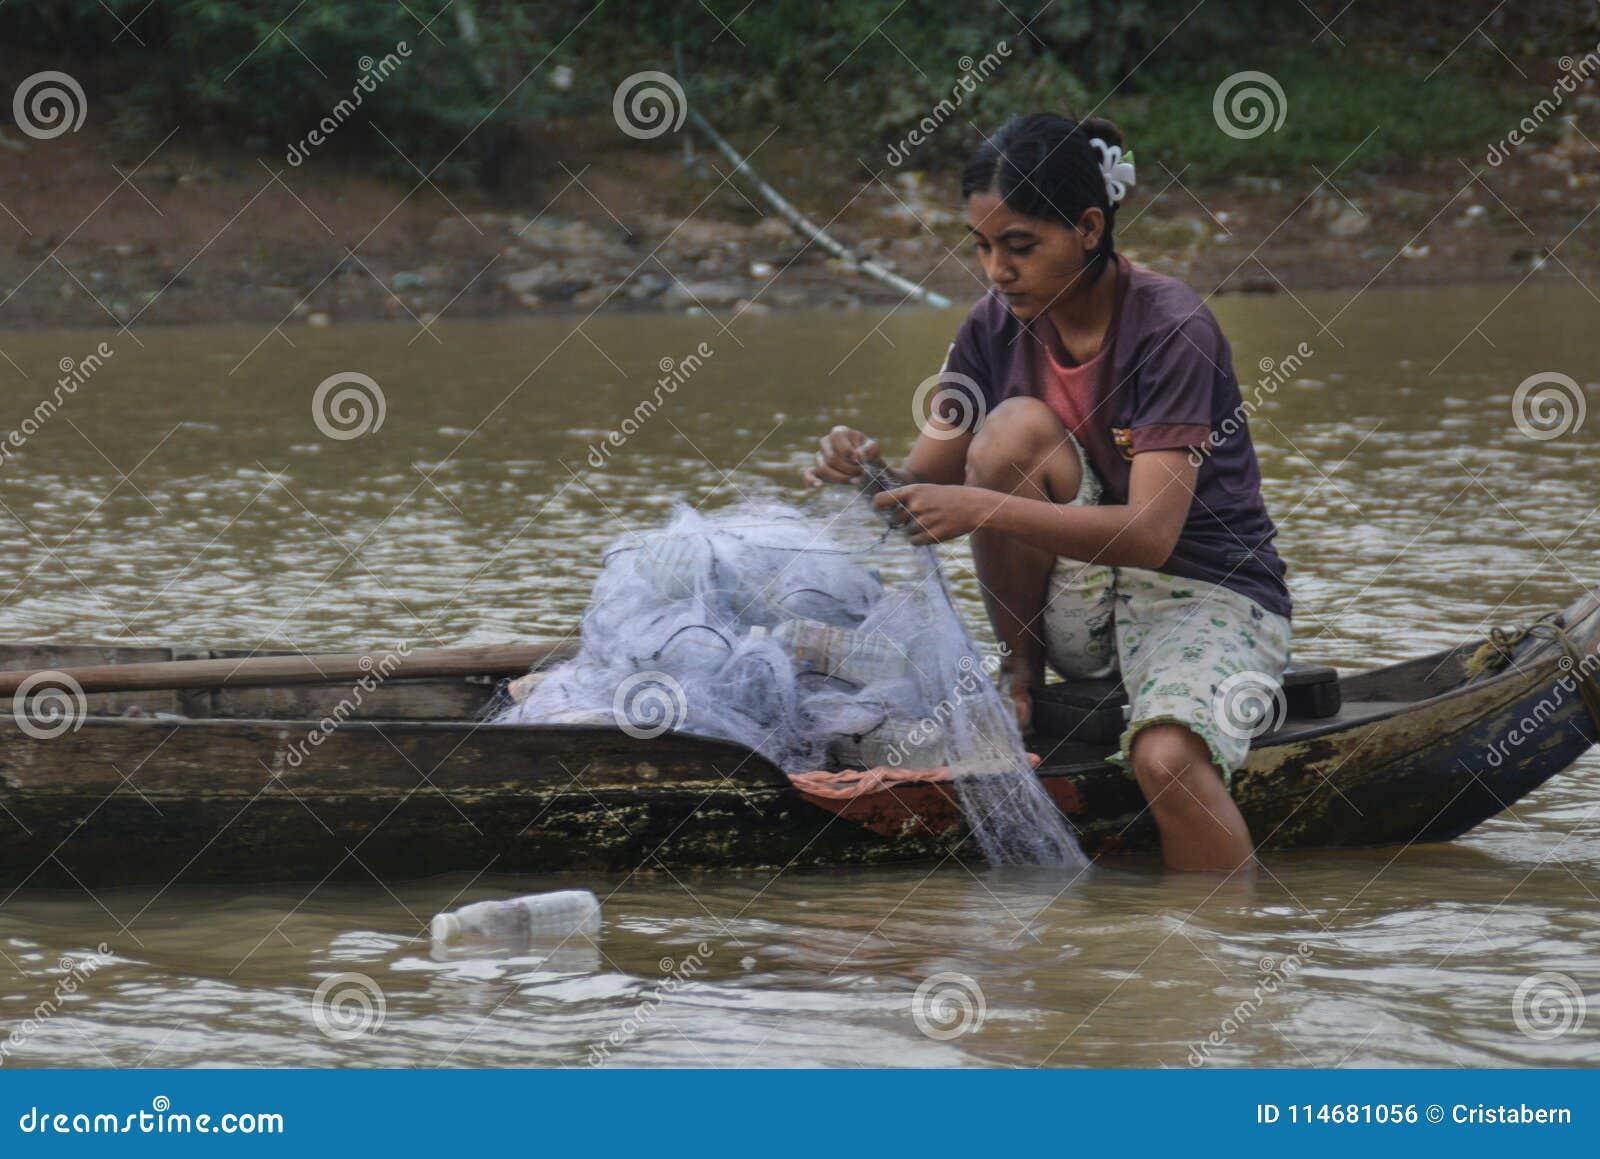 Reparera en fisher netto